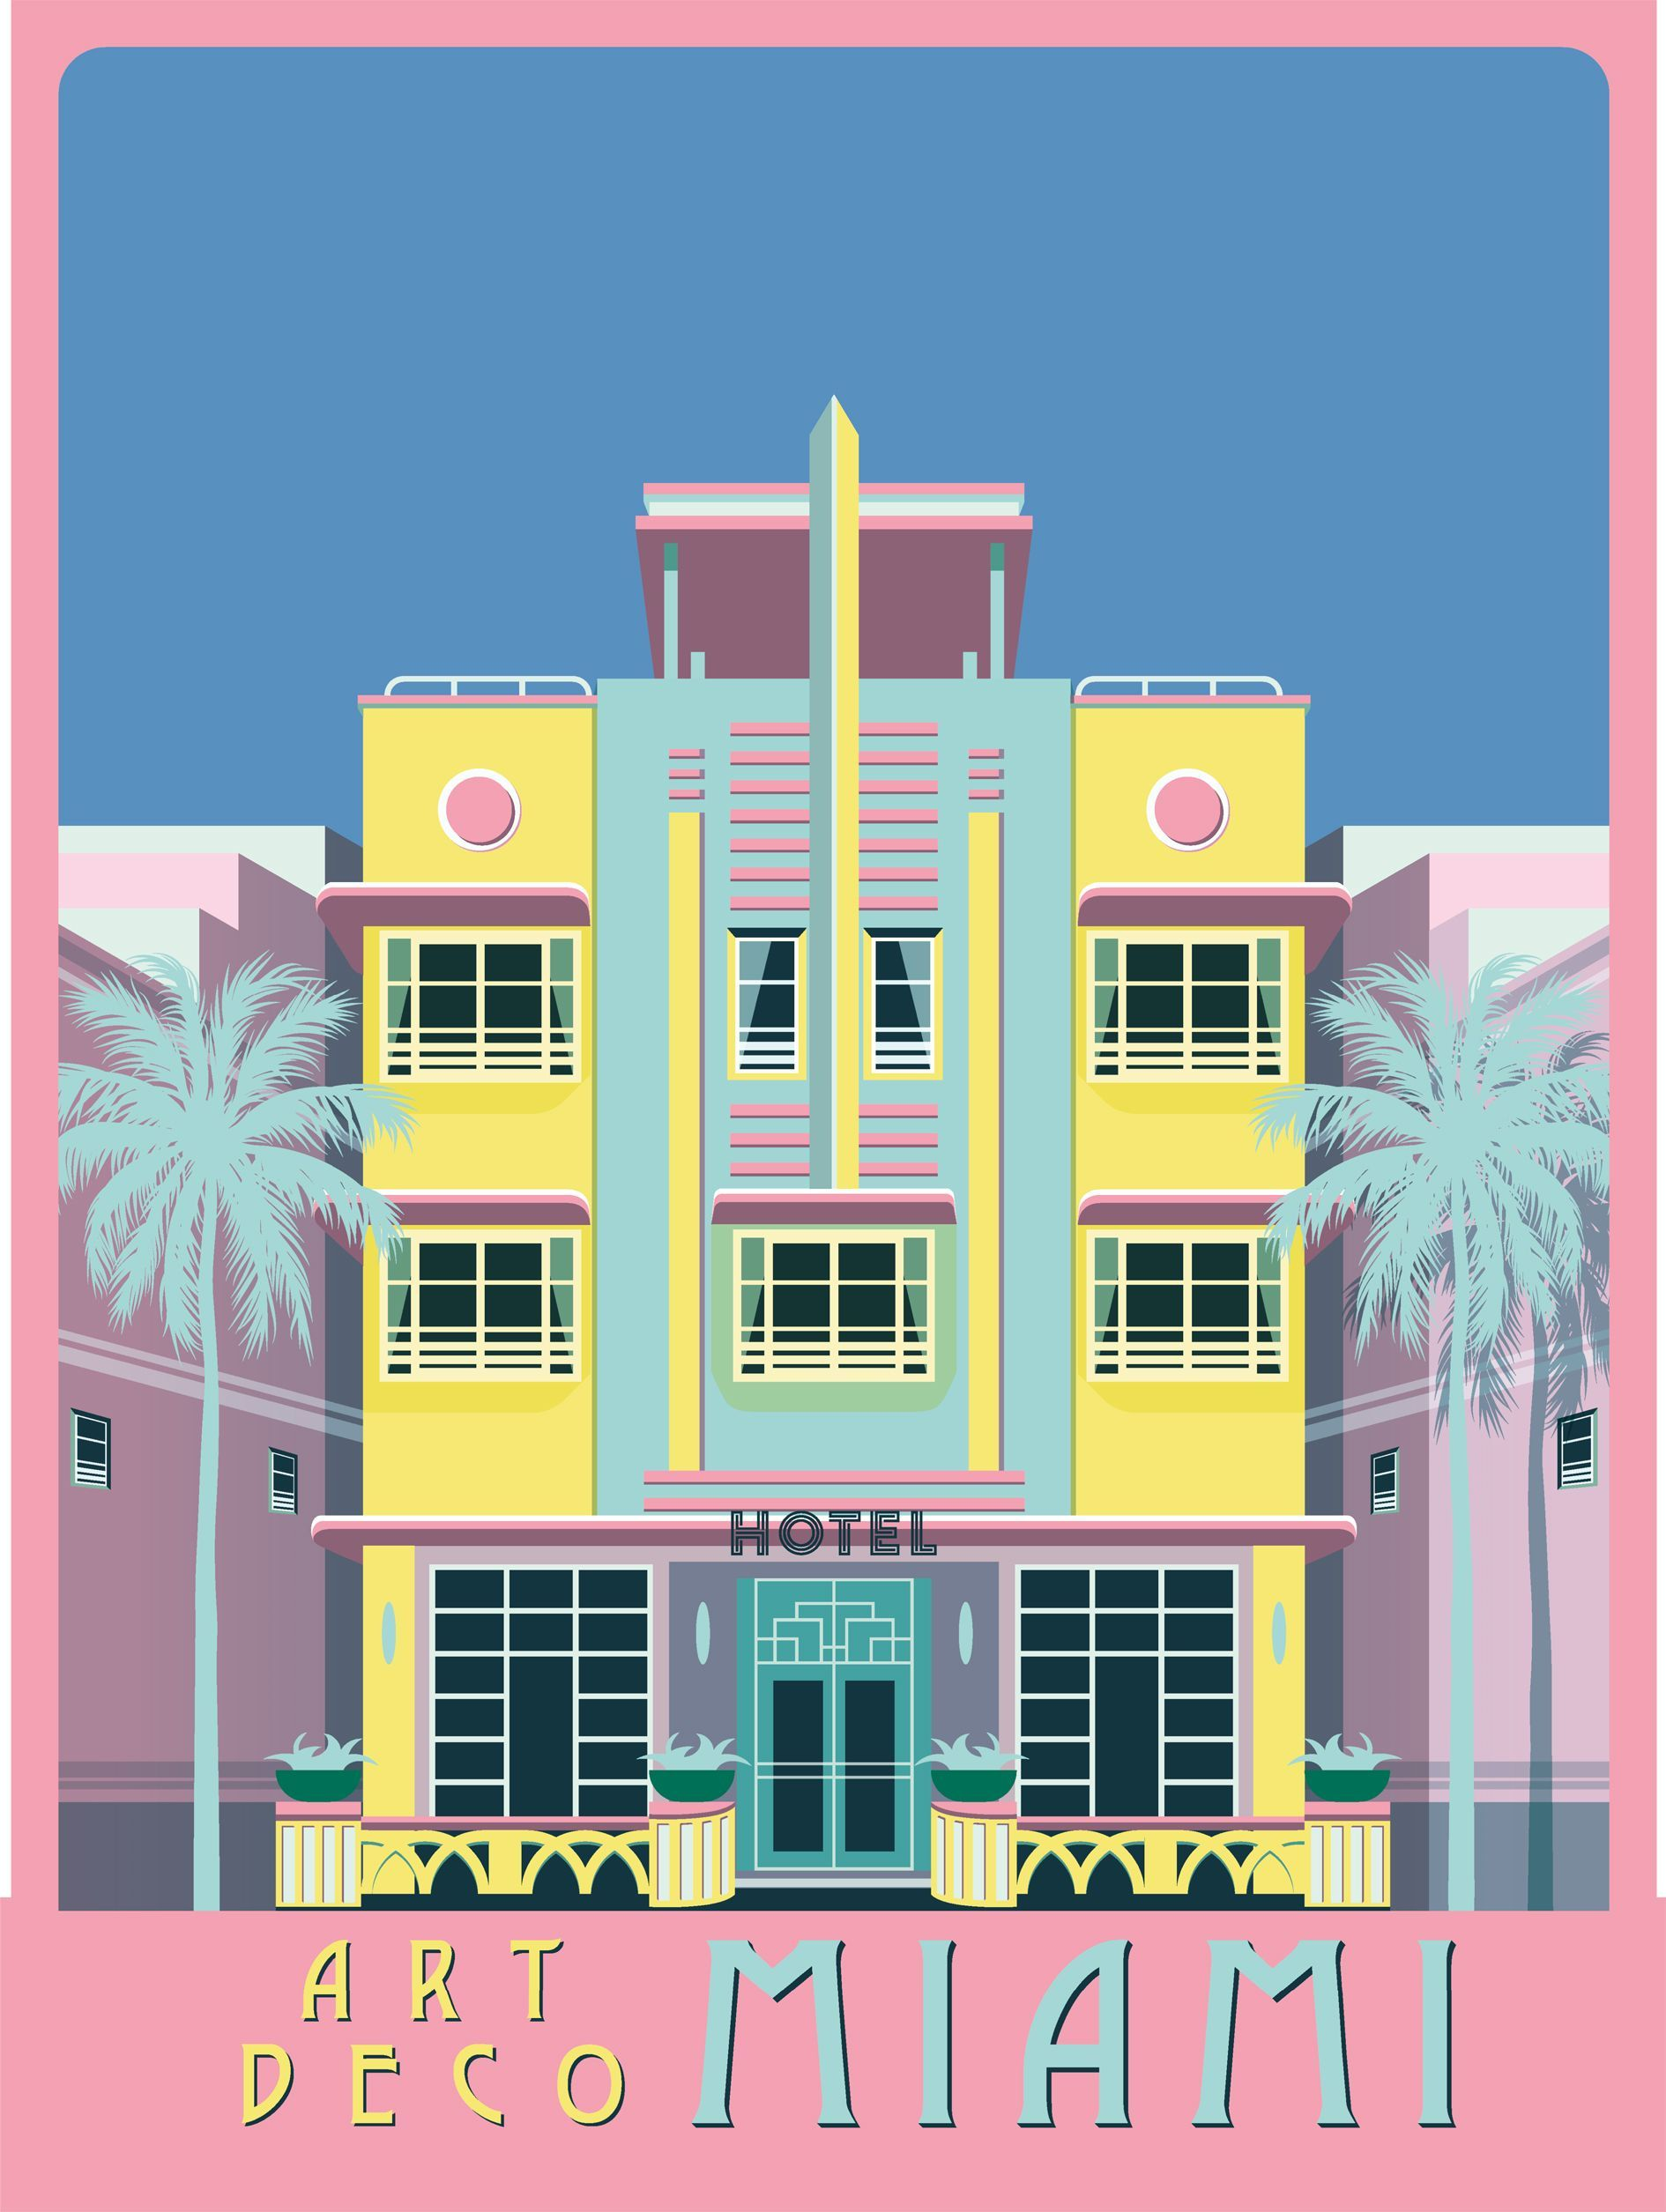 80s Art Retro Graphic Design Miami Art Deco Art Deco Illustration Art Deco Posters